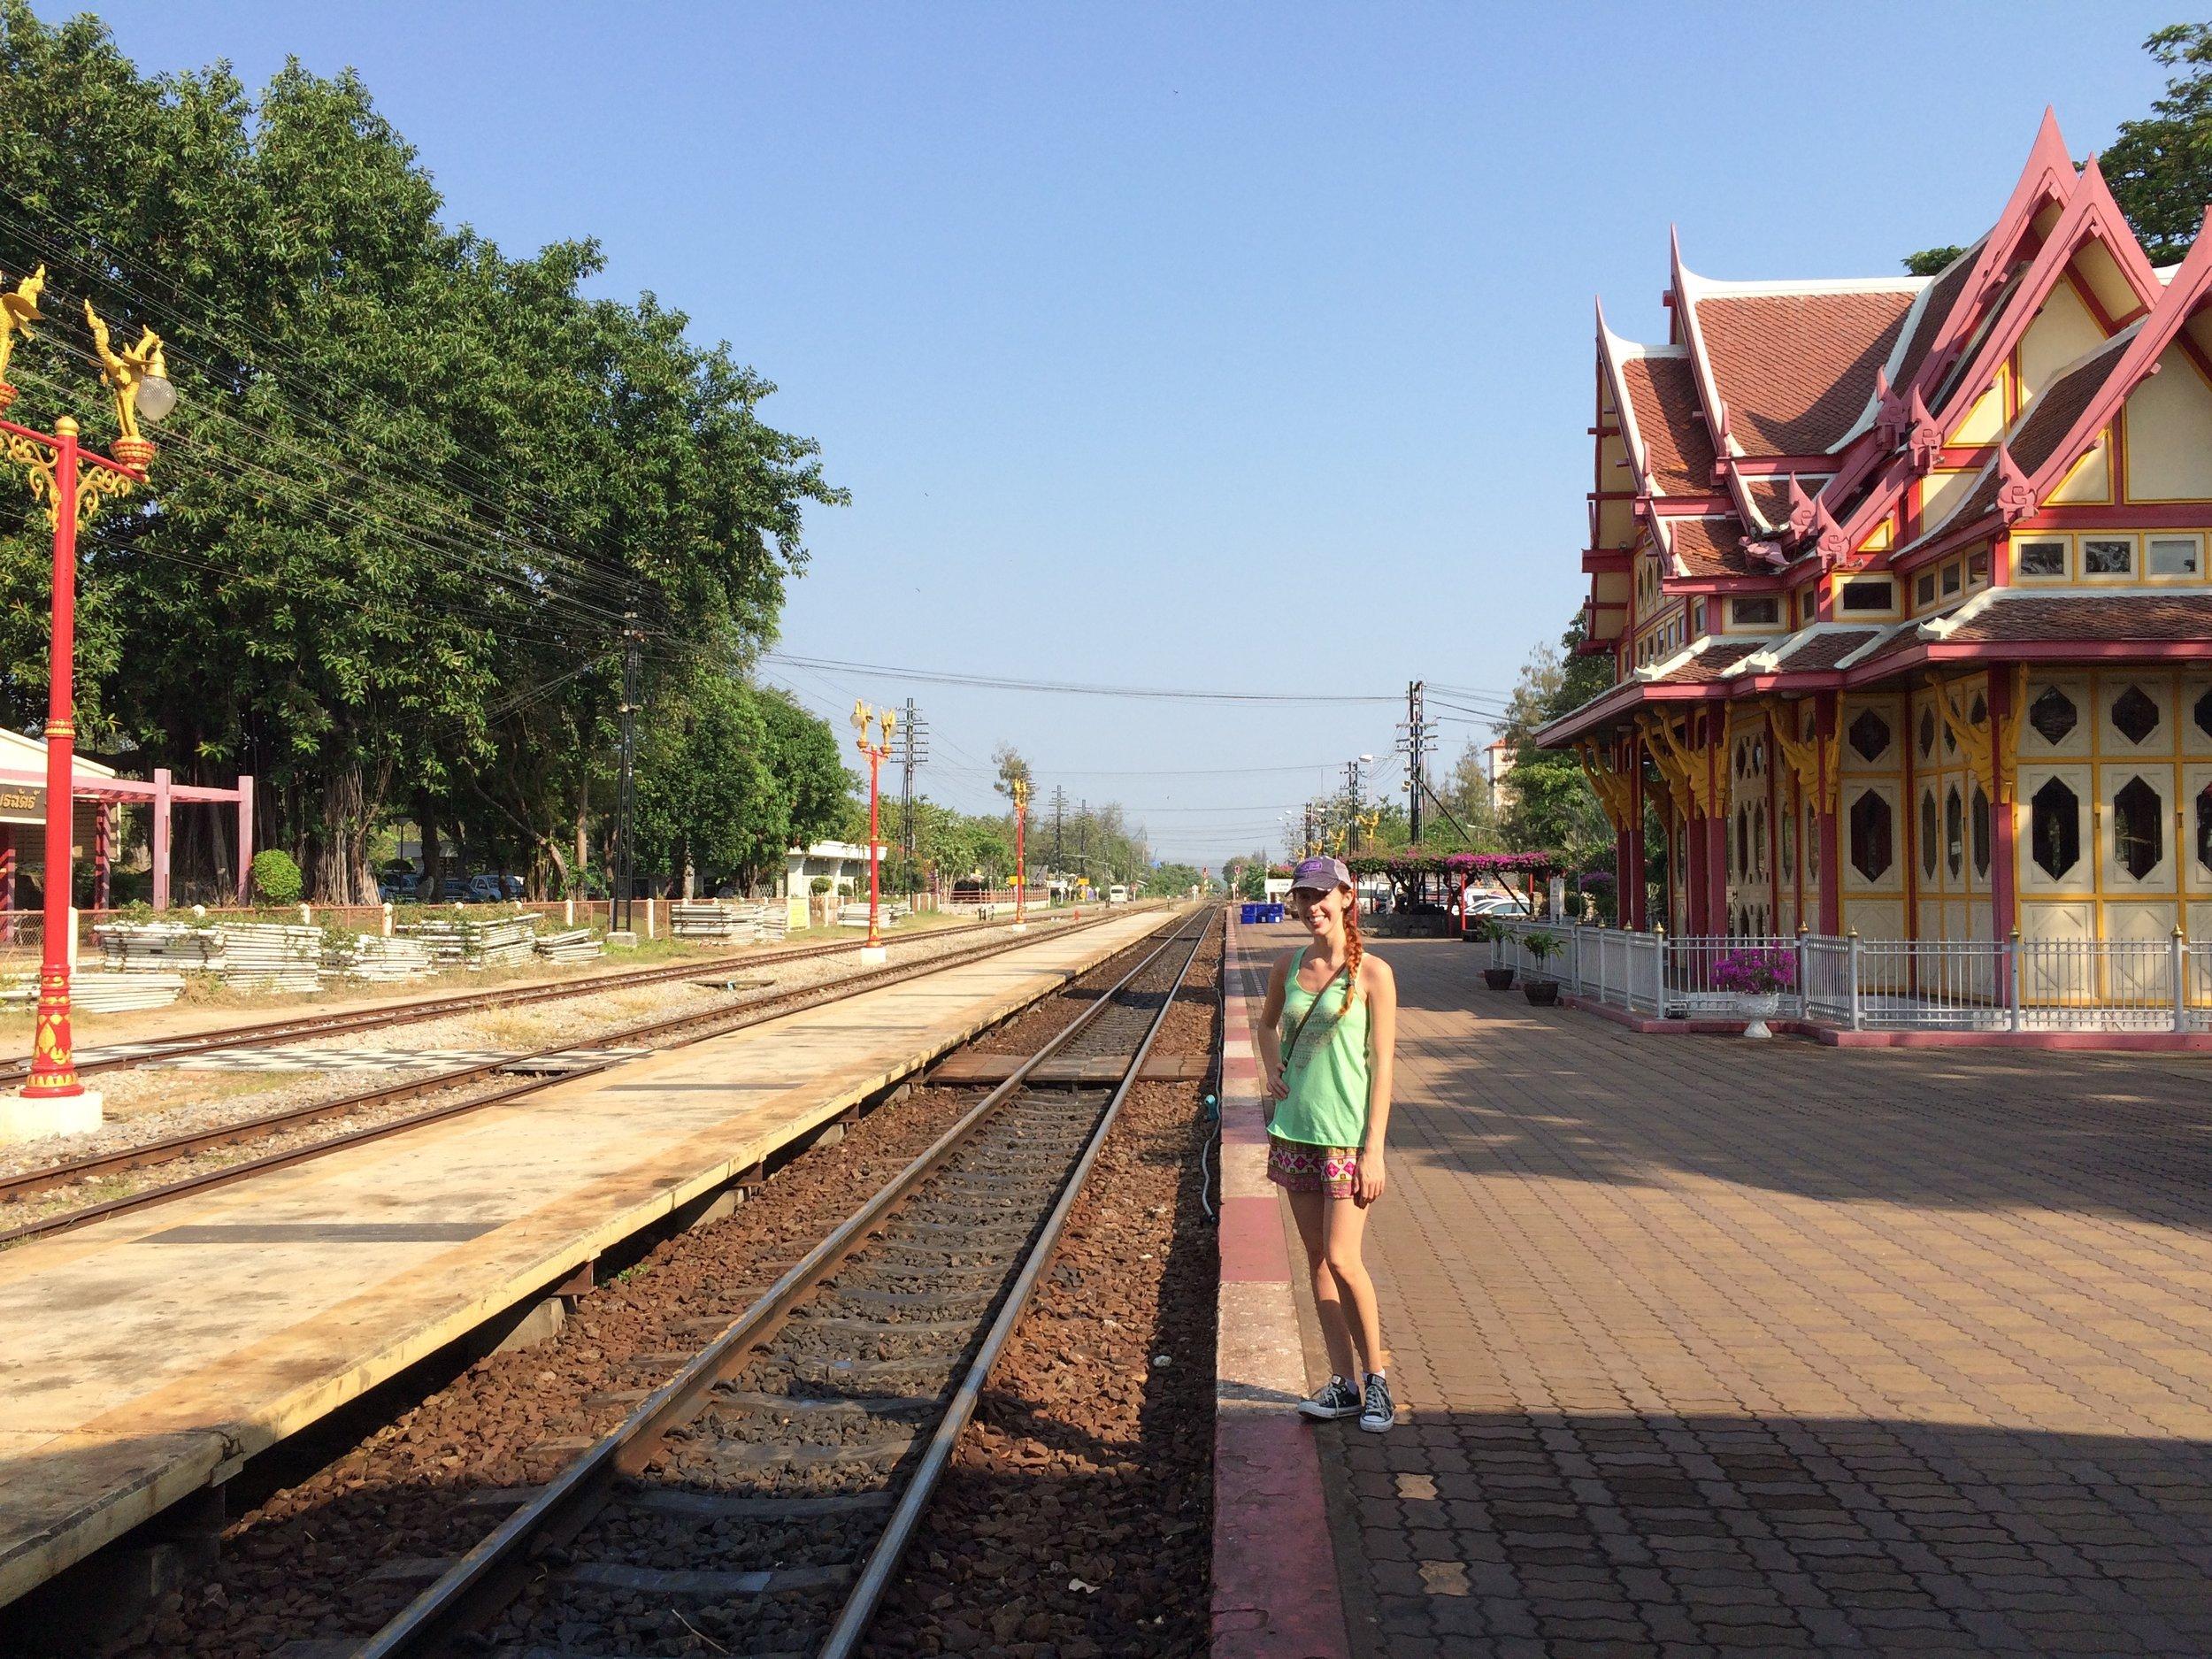 Train station in Hua Hin, Thailand